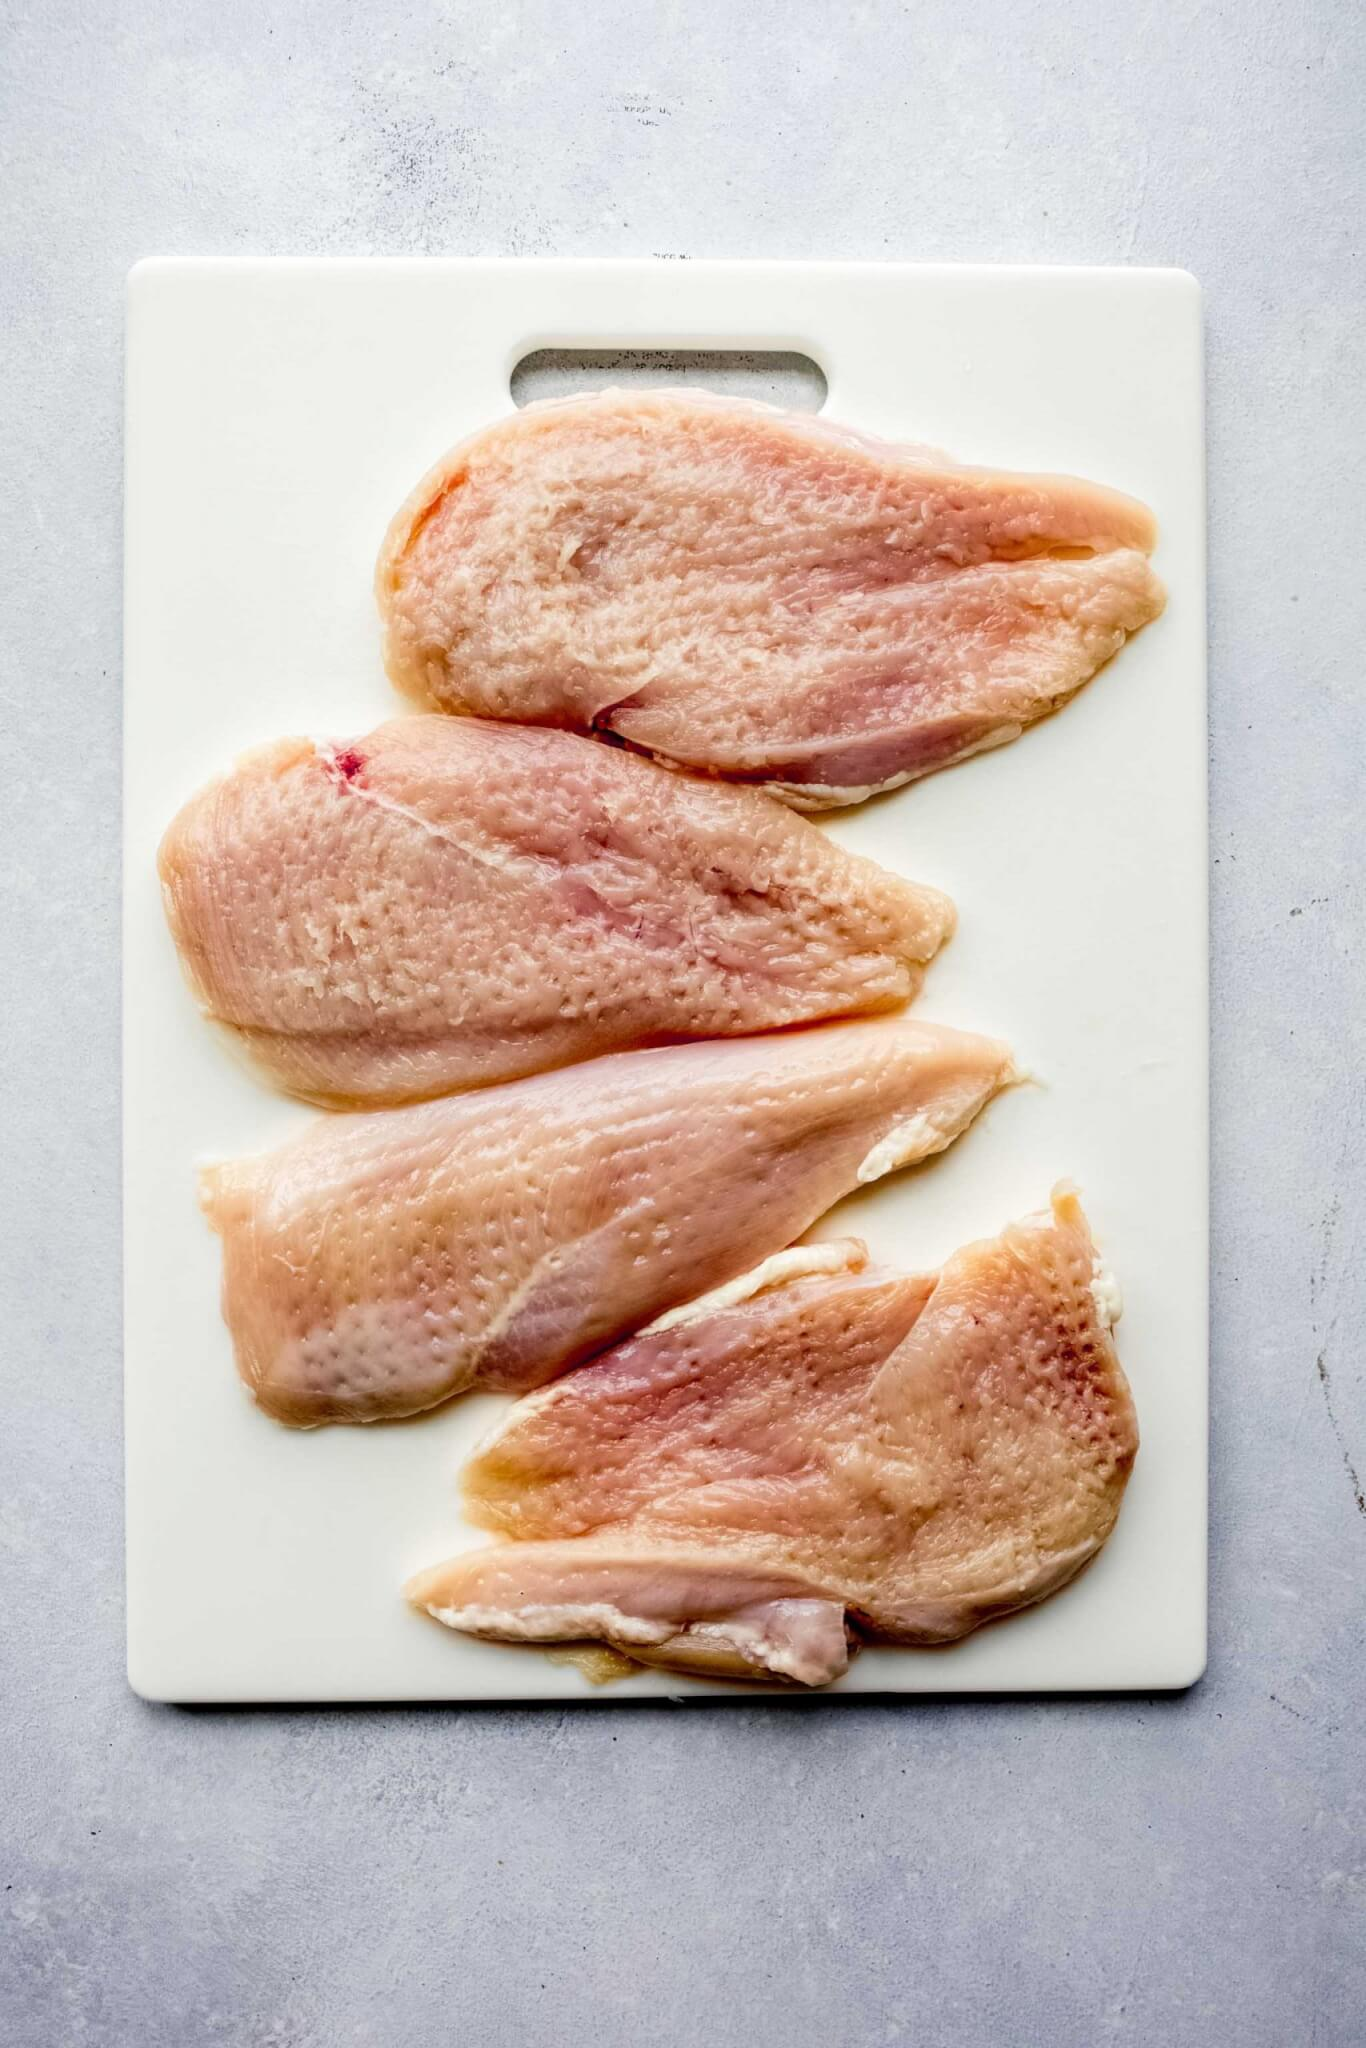 Chicken cutlets on cutting board.